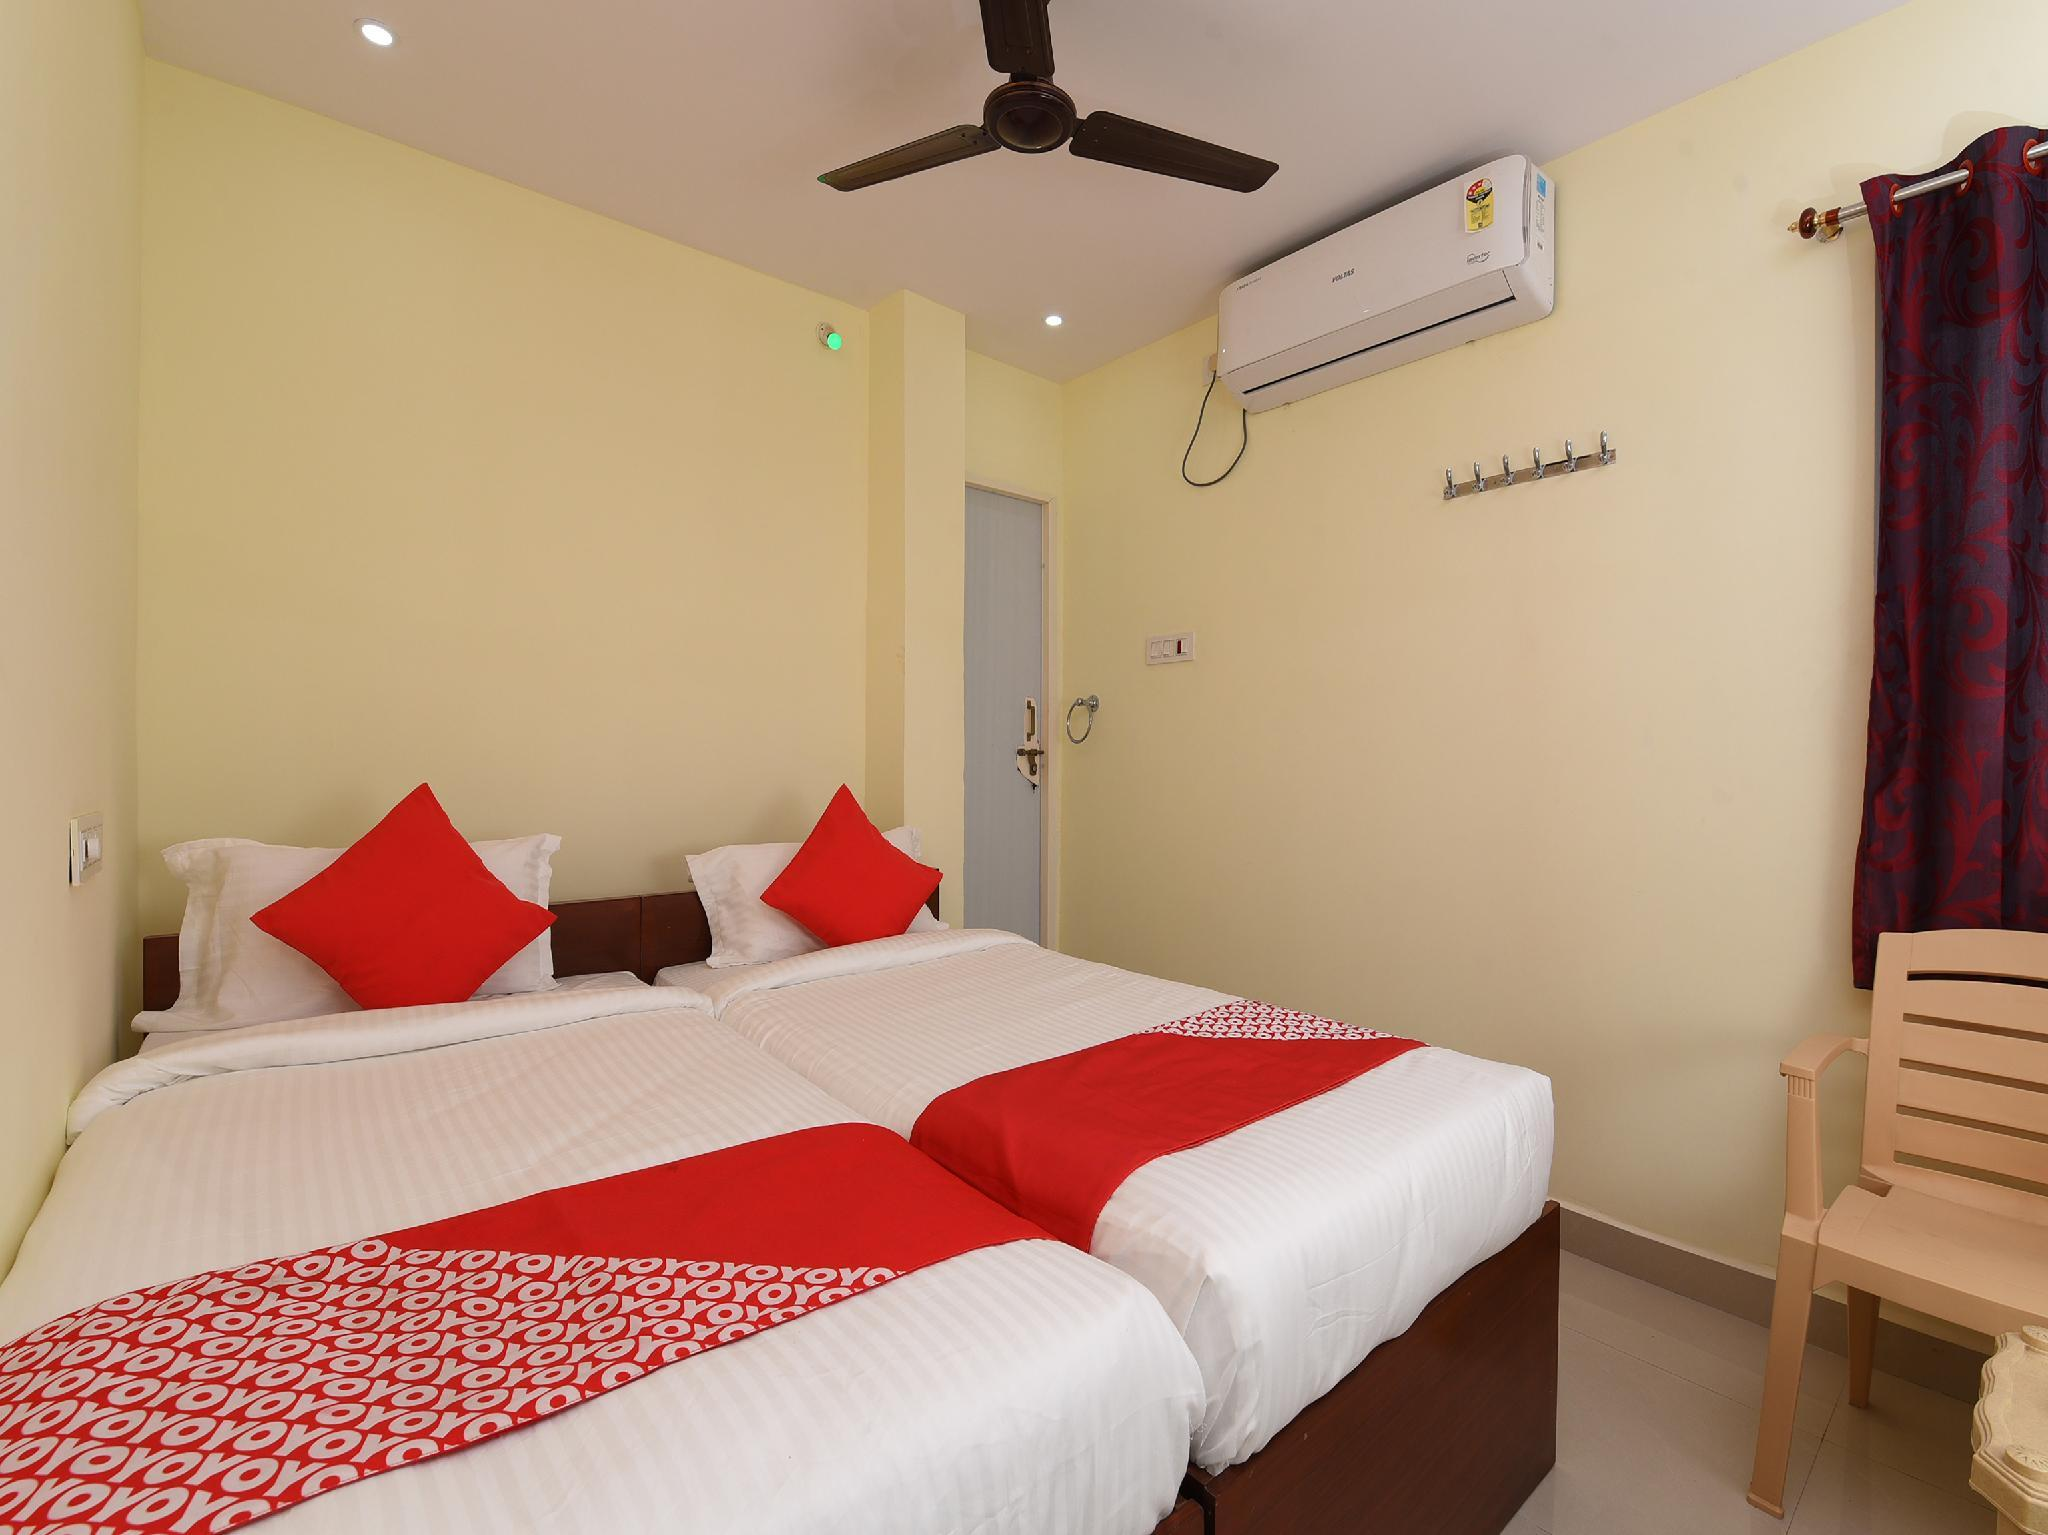 OYO 24824 Andhra Pradesh Hotels Association